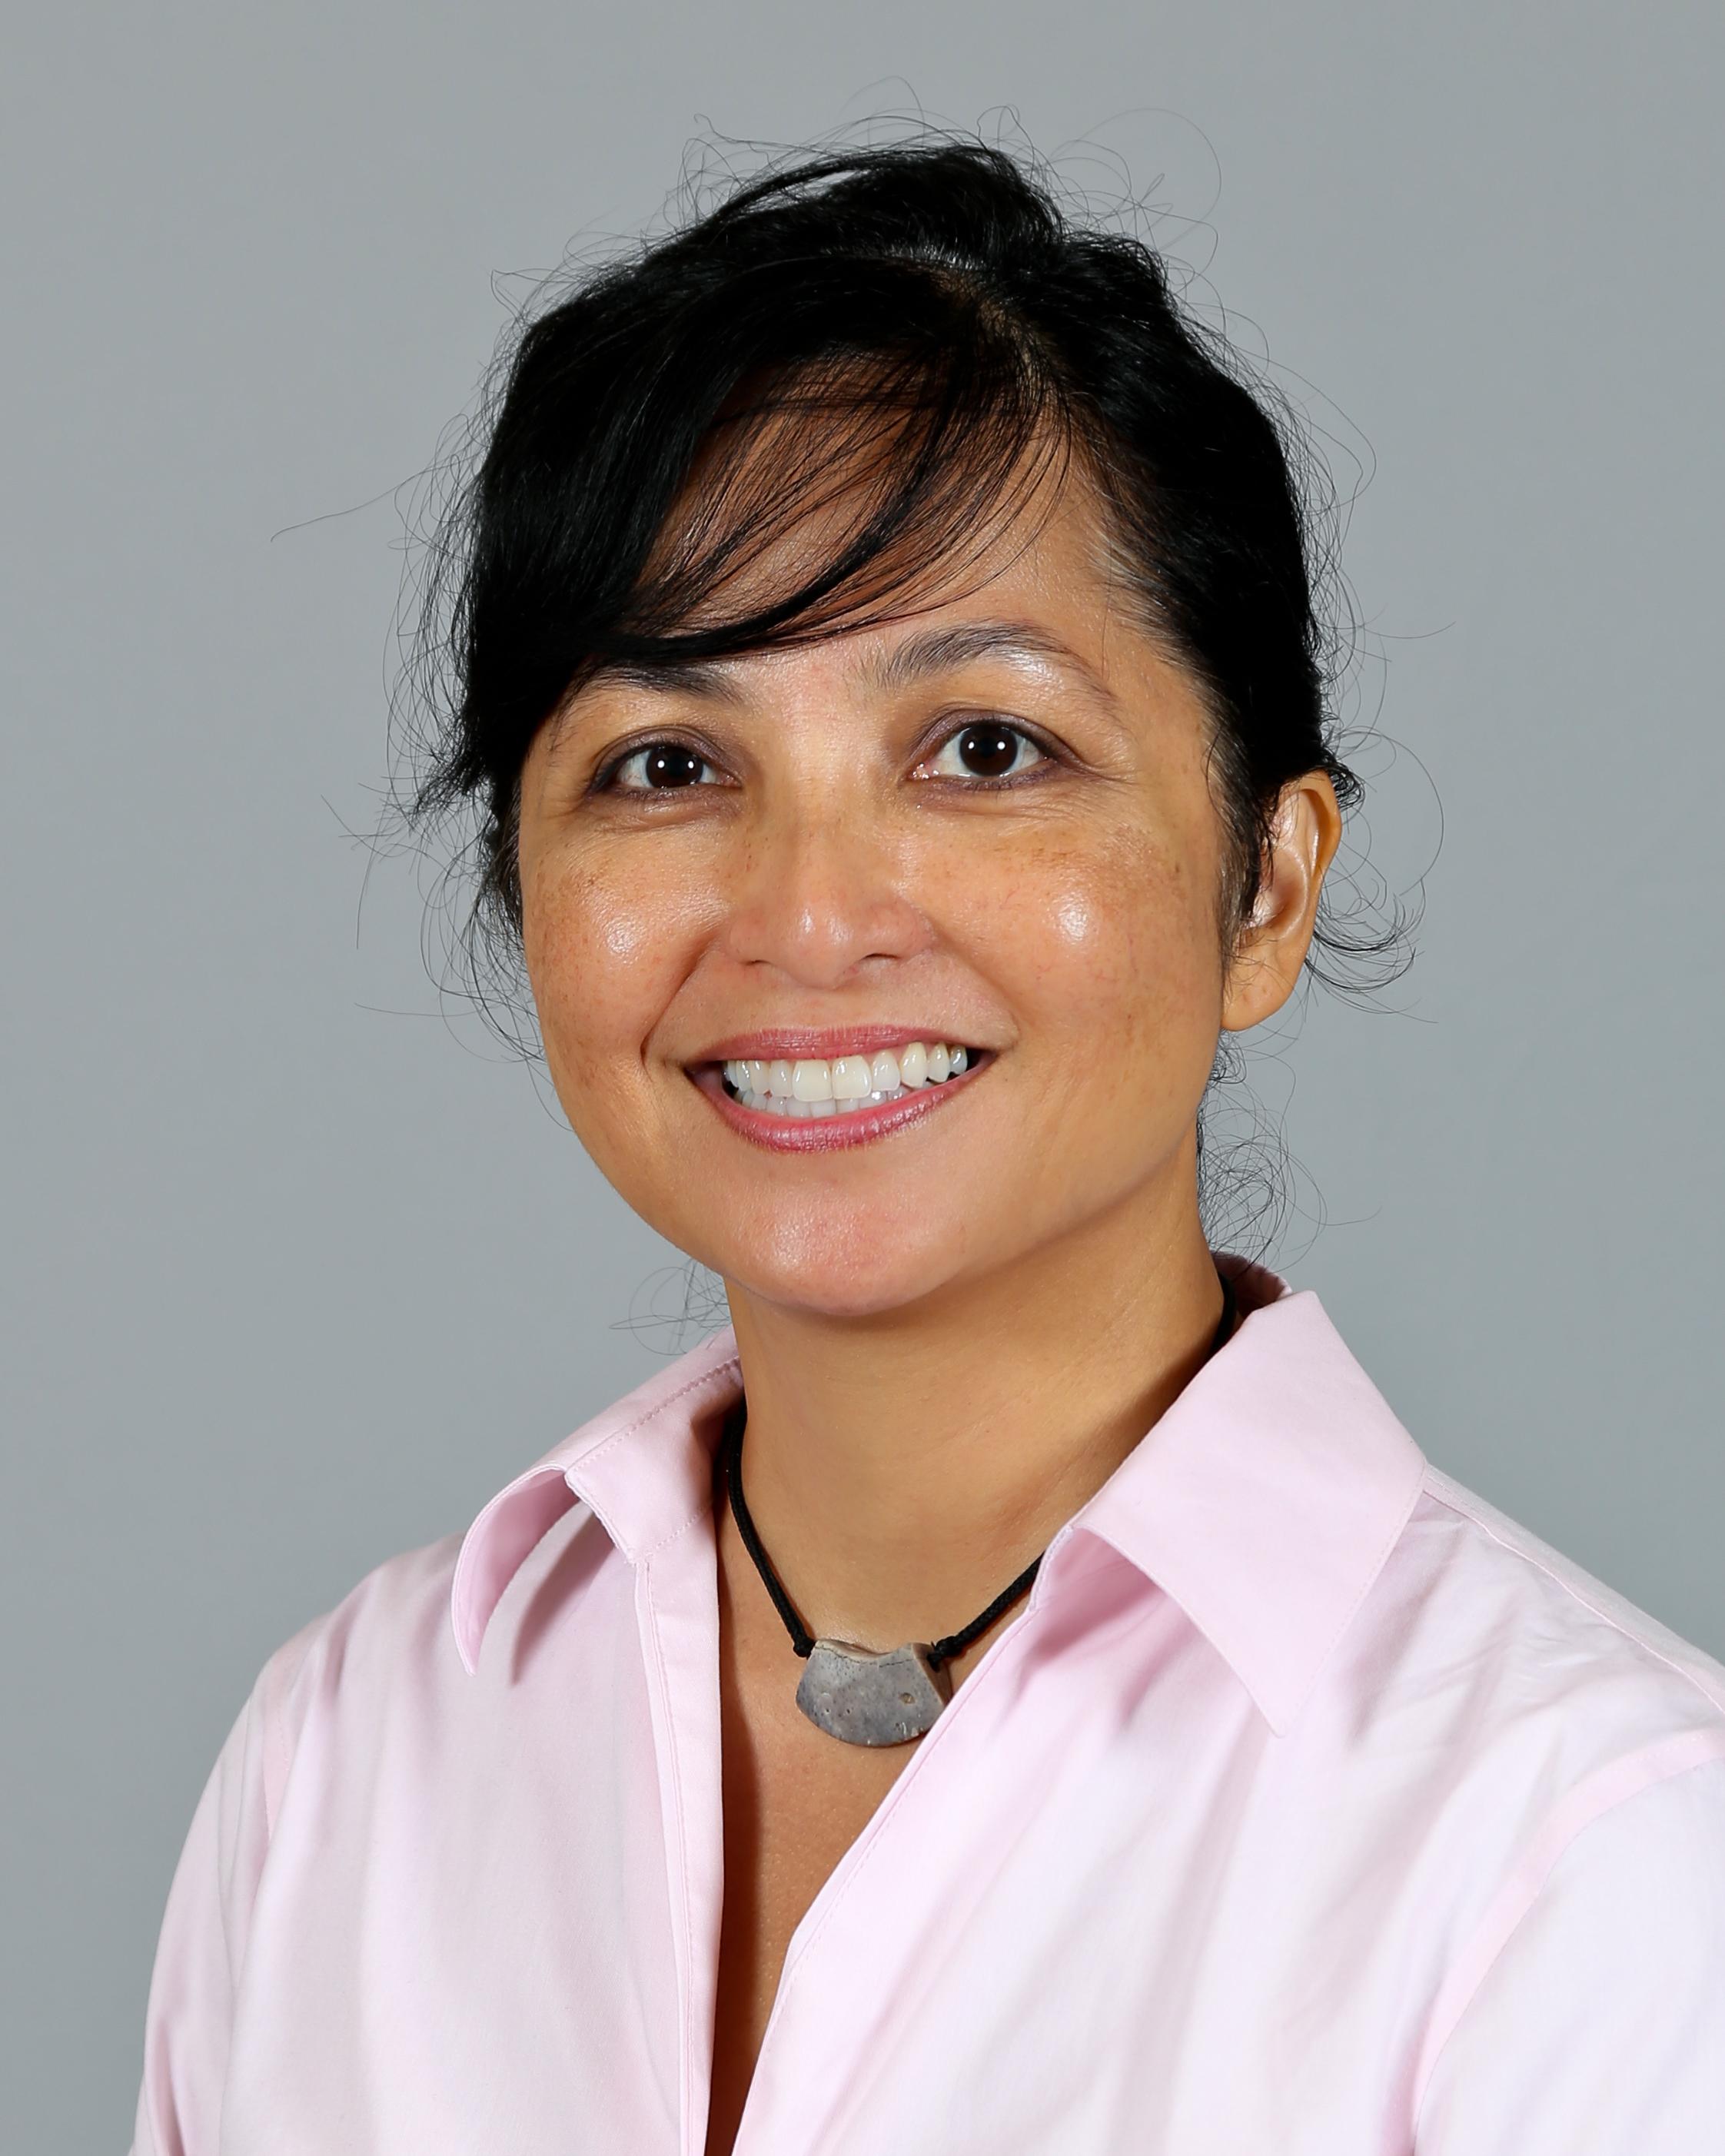 Dora Borja Miura Portrait Photo